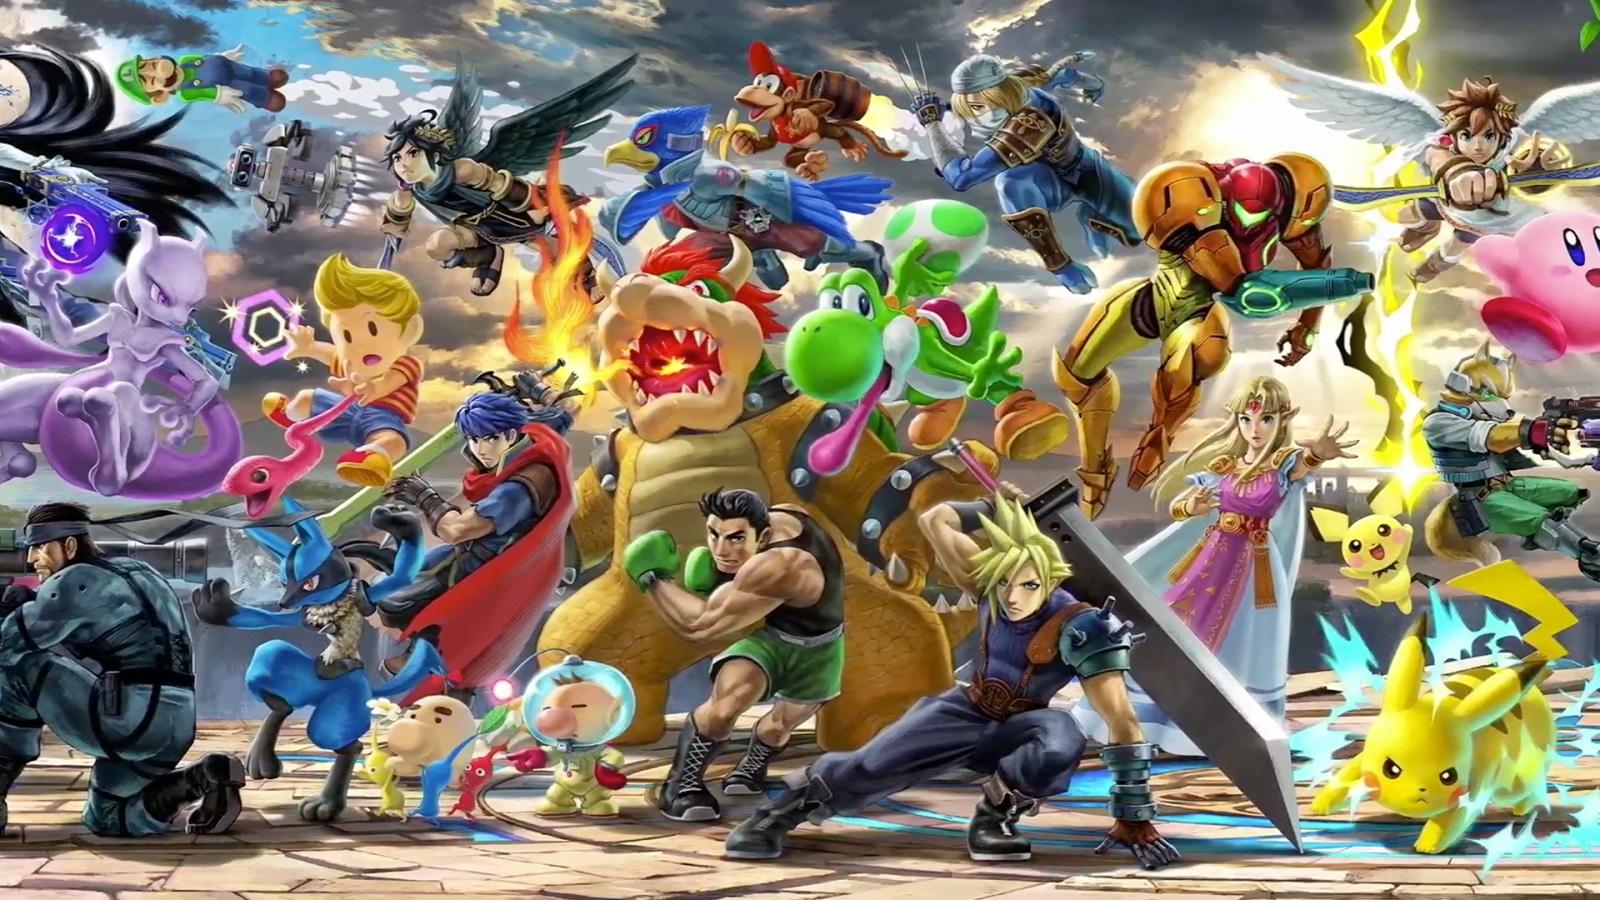 Smash Bros. Ultimate is gonna headline Evo this year screenshot